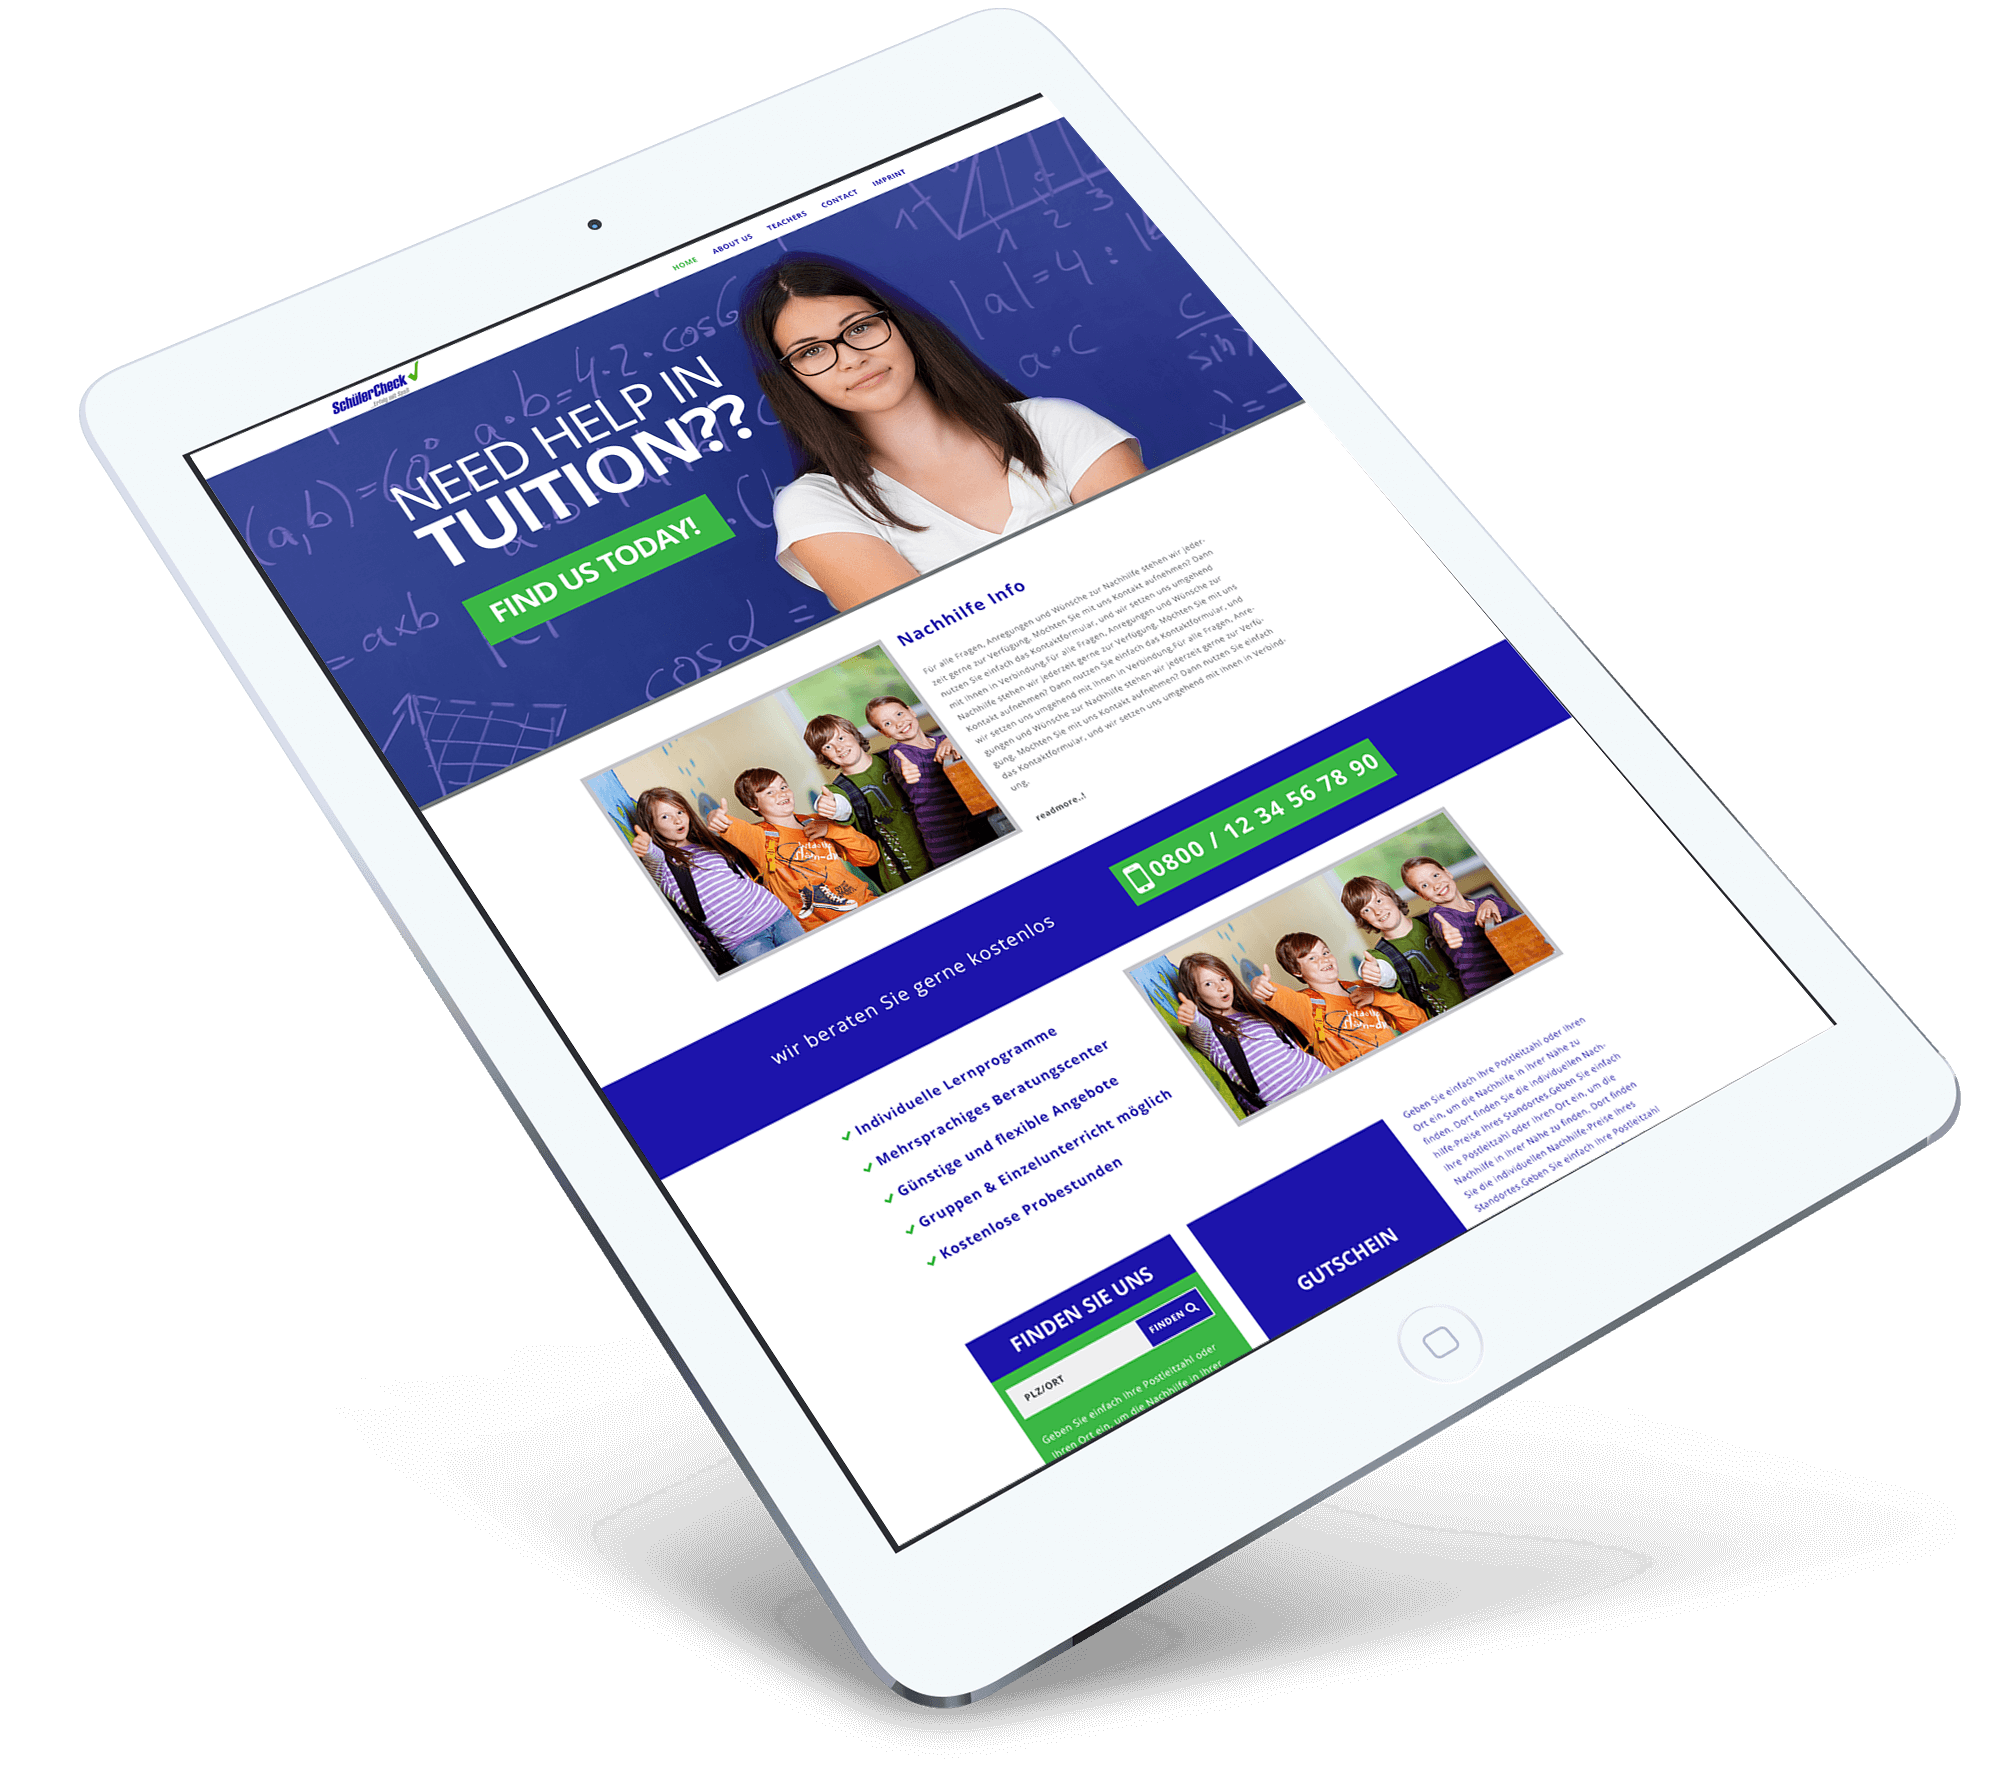 Brandcrock-SchulerCheck-BrandCrock-portfolio-home-ipad